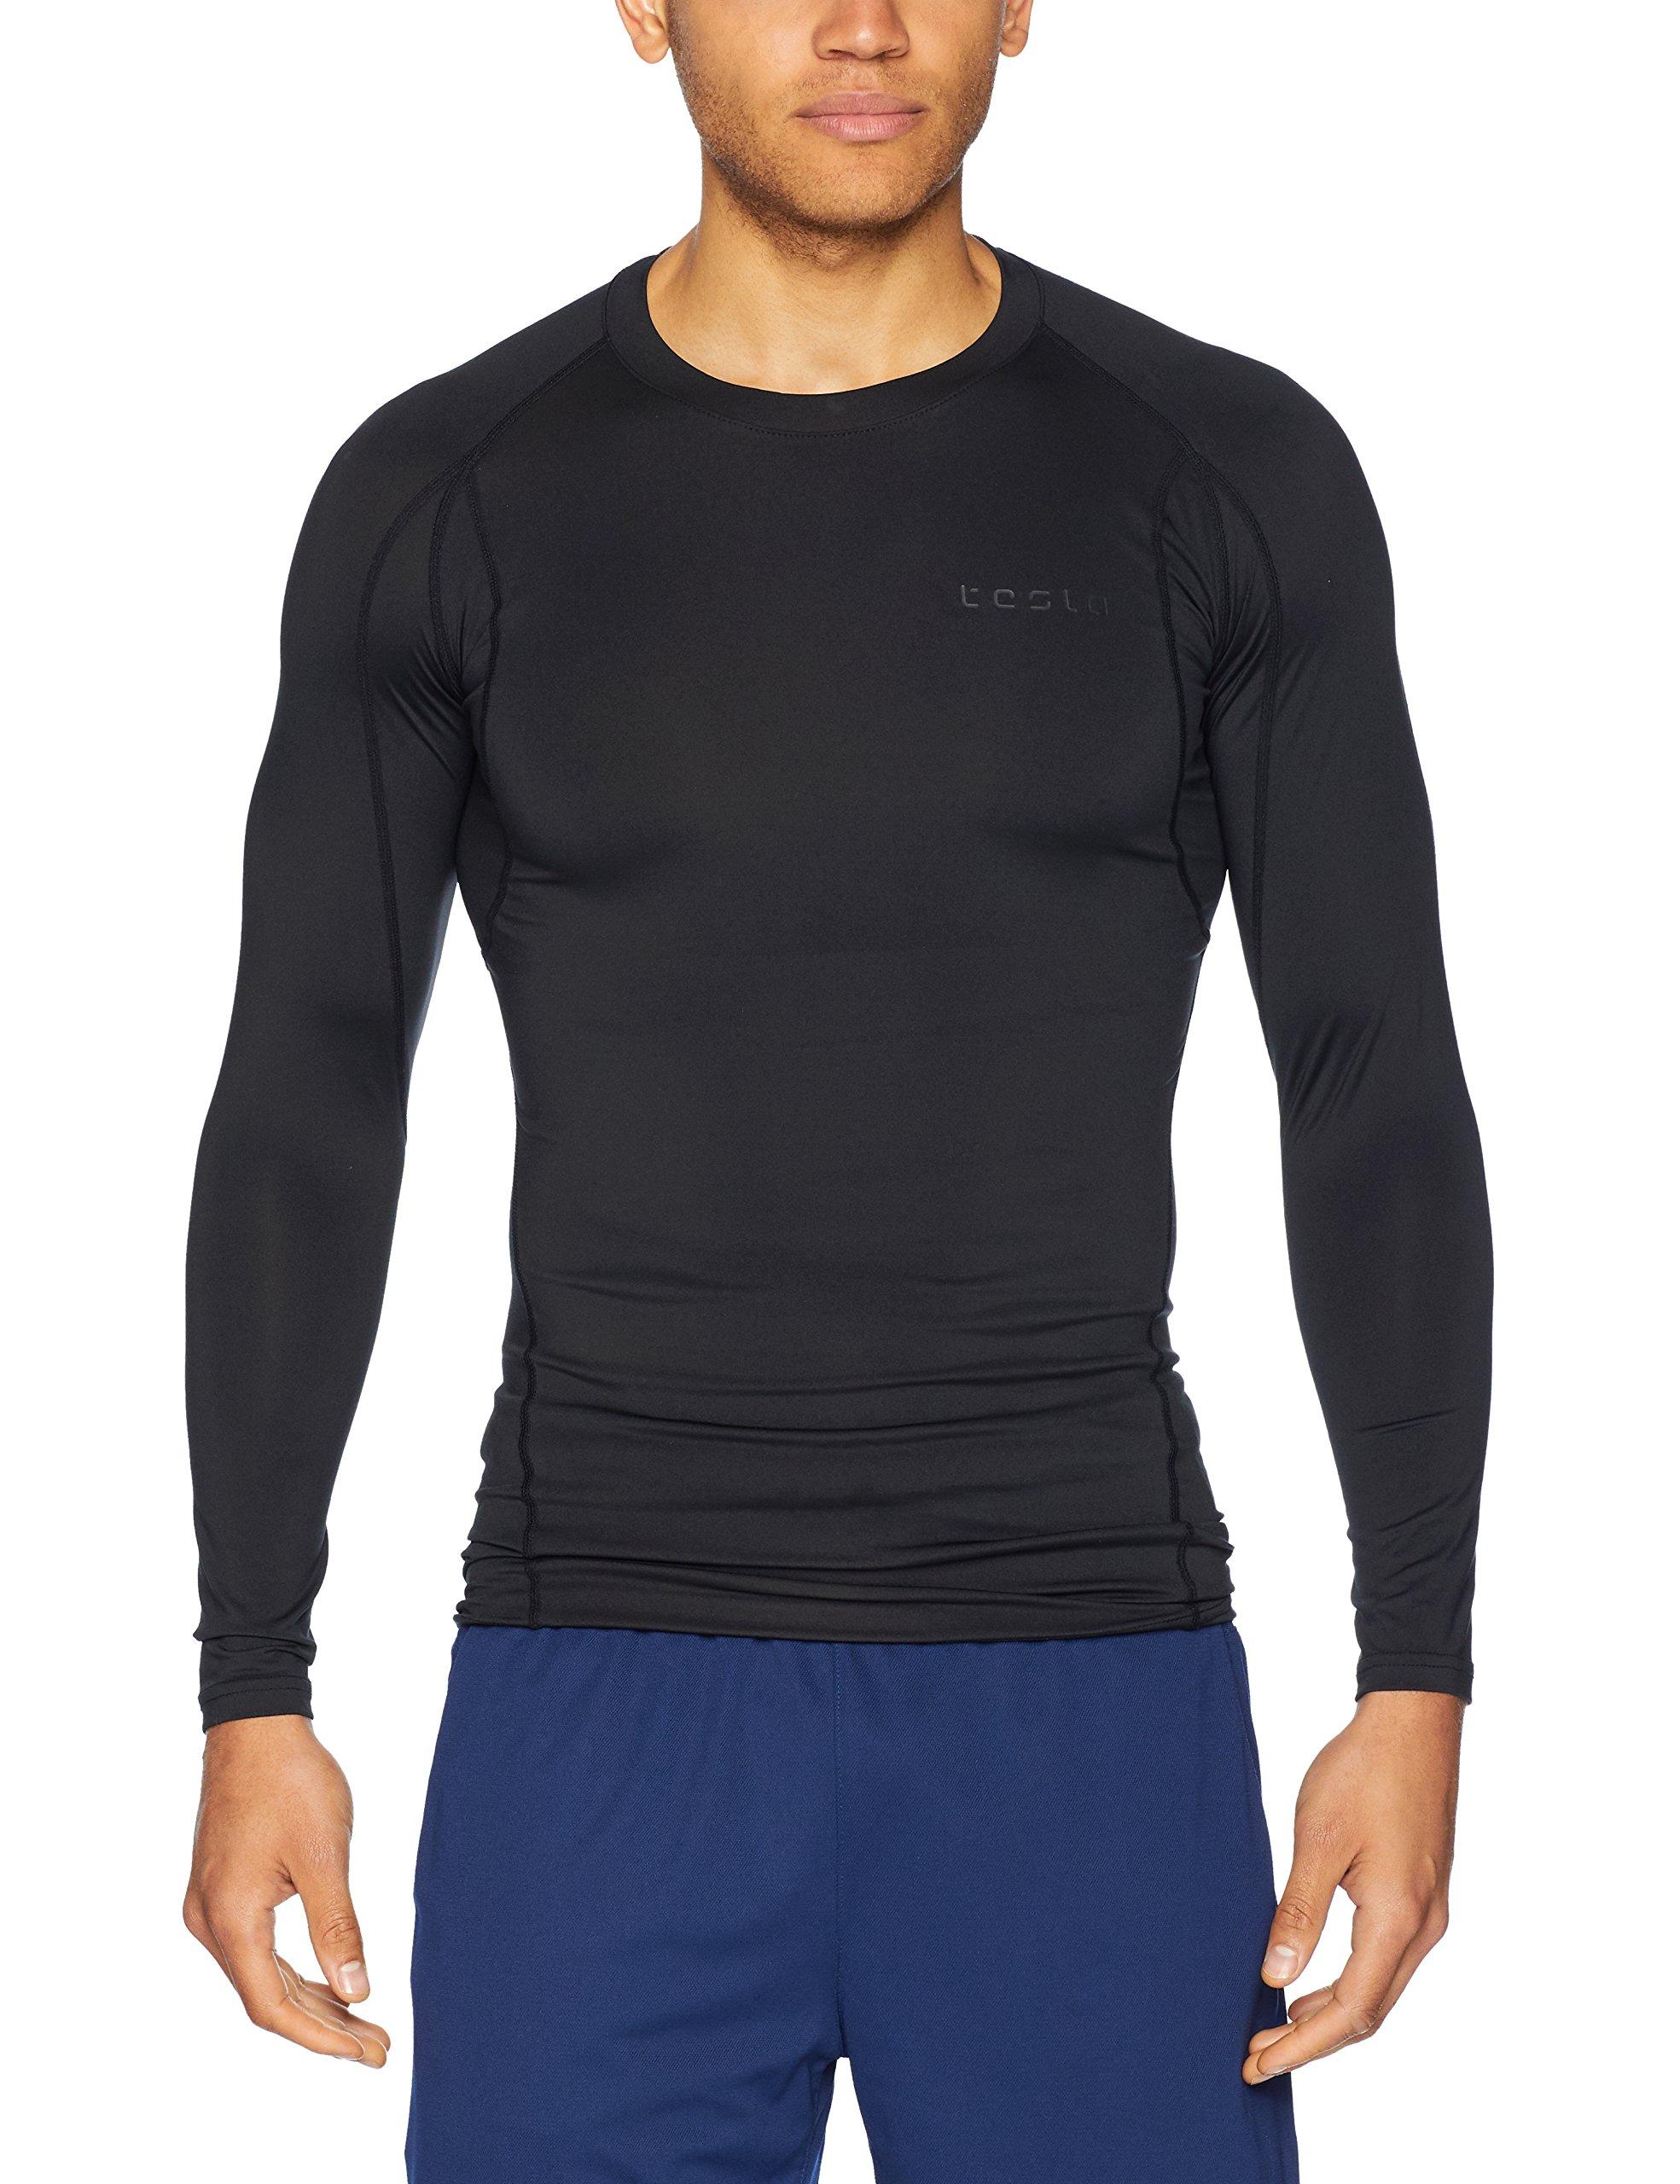 TSLA TM-MUD11-KLB_2X-Large Men's Long Sleeve T-Shirt Baselayer Cool Dry Compression Top MUD11